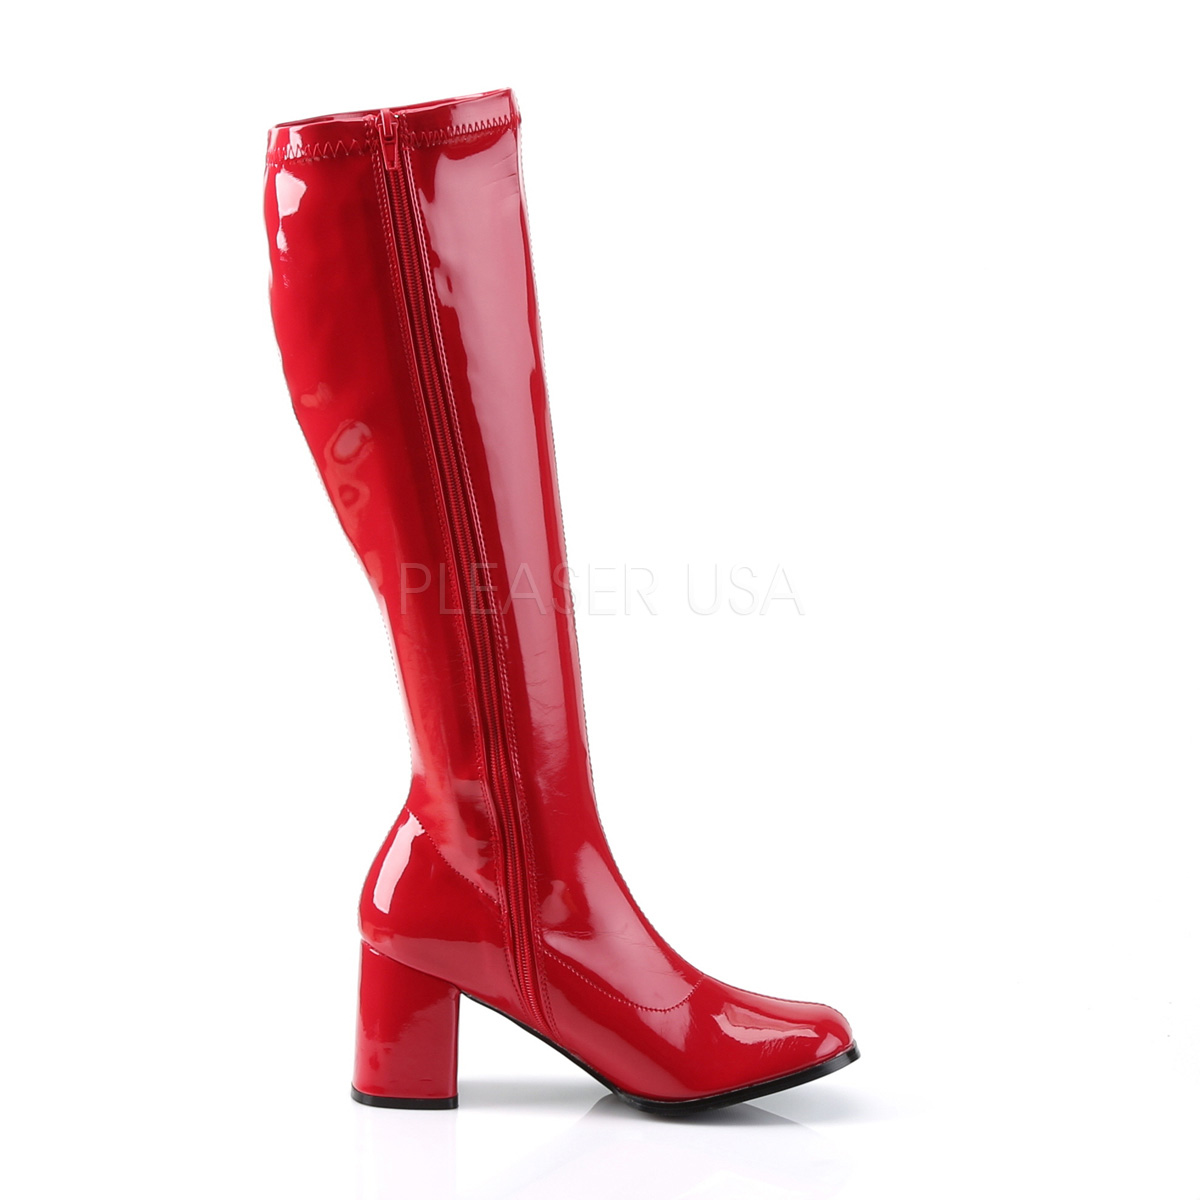 FUNTASMA(Pleaser) GOGO-300 赤 レッド ニーハイブーツ GOGOブーツ コスプレ用ブーツ イベント 衣装 キャンギャルブーツ ロングブーツ